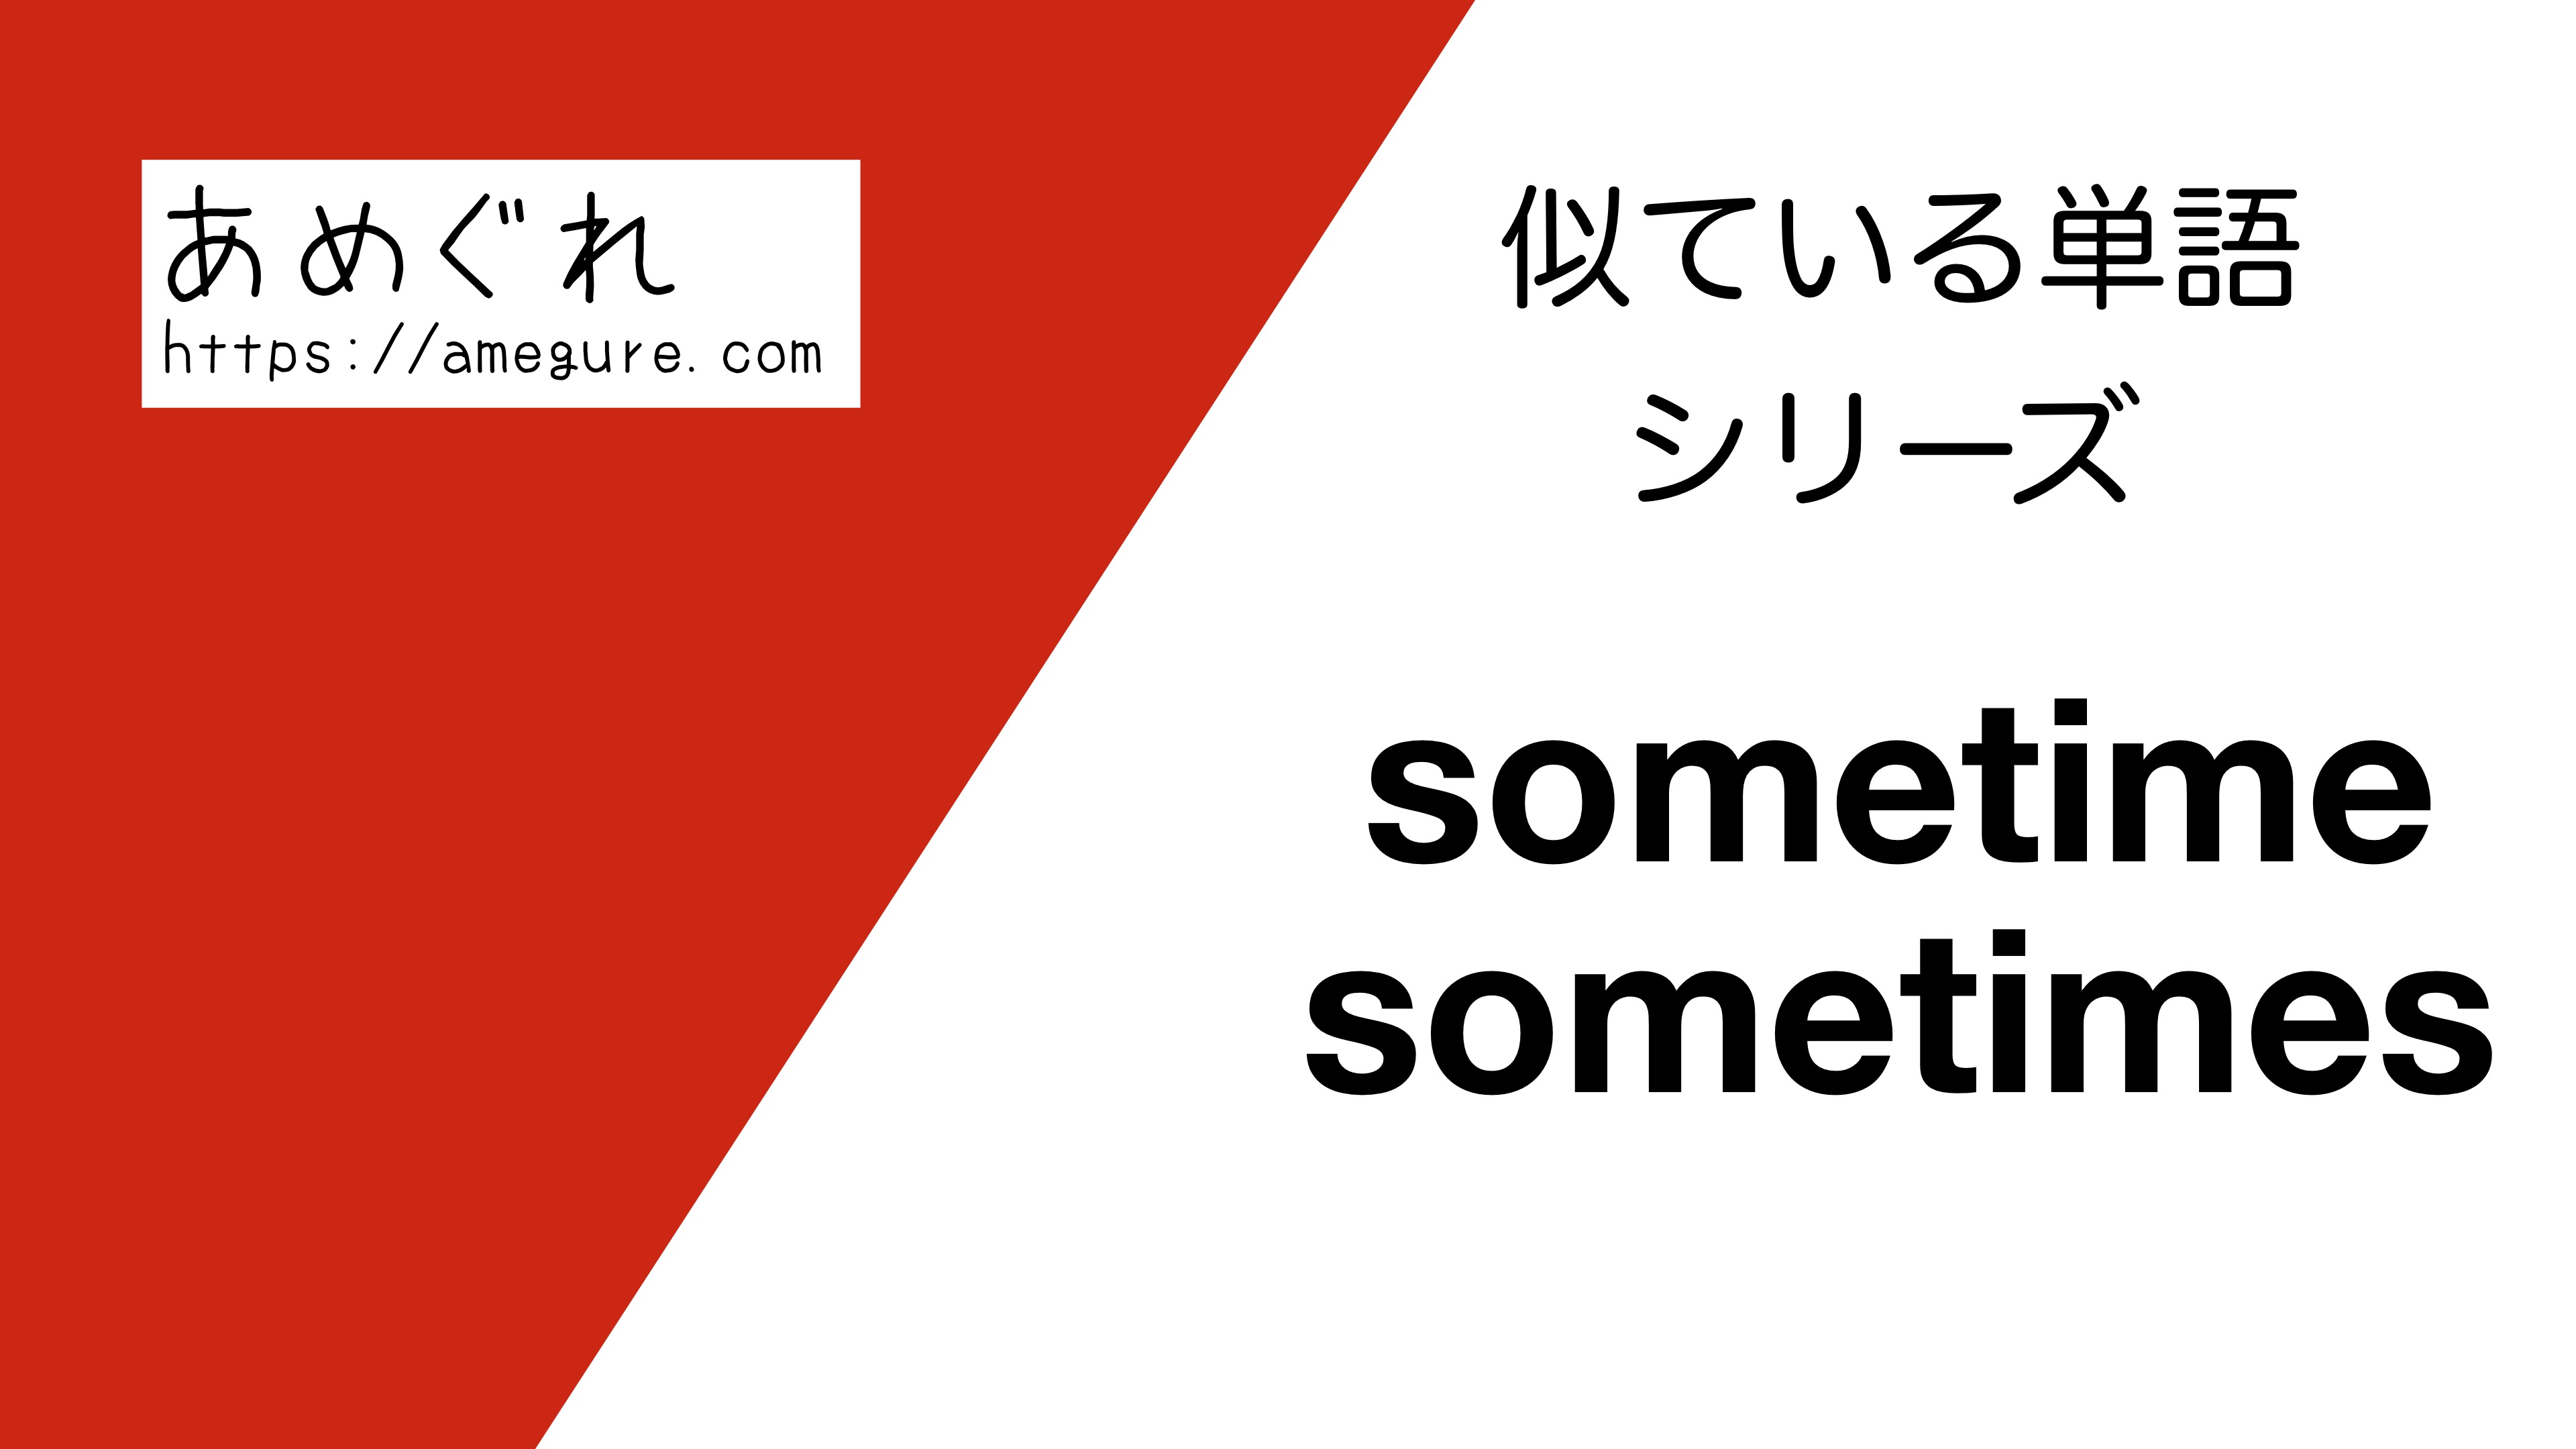 sometime-sometimes違い